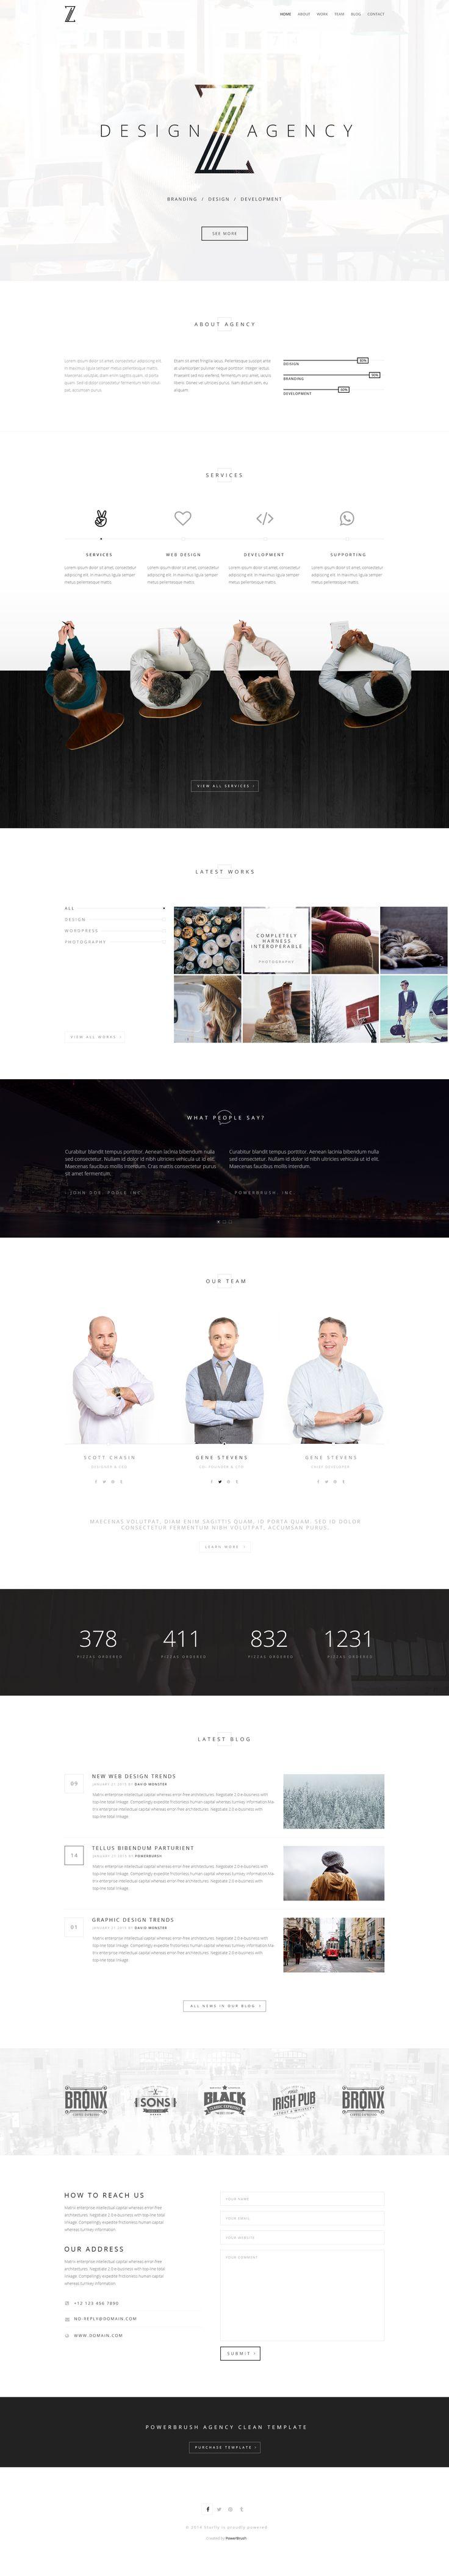 Zuut - Clean Agency WordPress Theme • Download ➝ https://themeforest.net/item/zuut-clean-agency-wordpress-theme/11937895?ref=pxcr